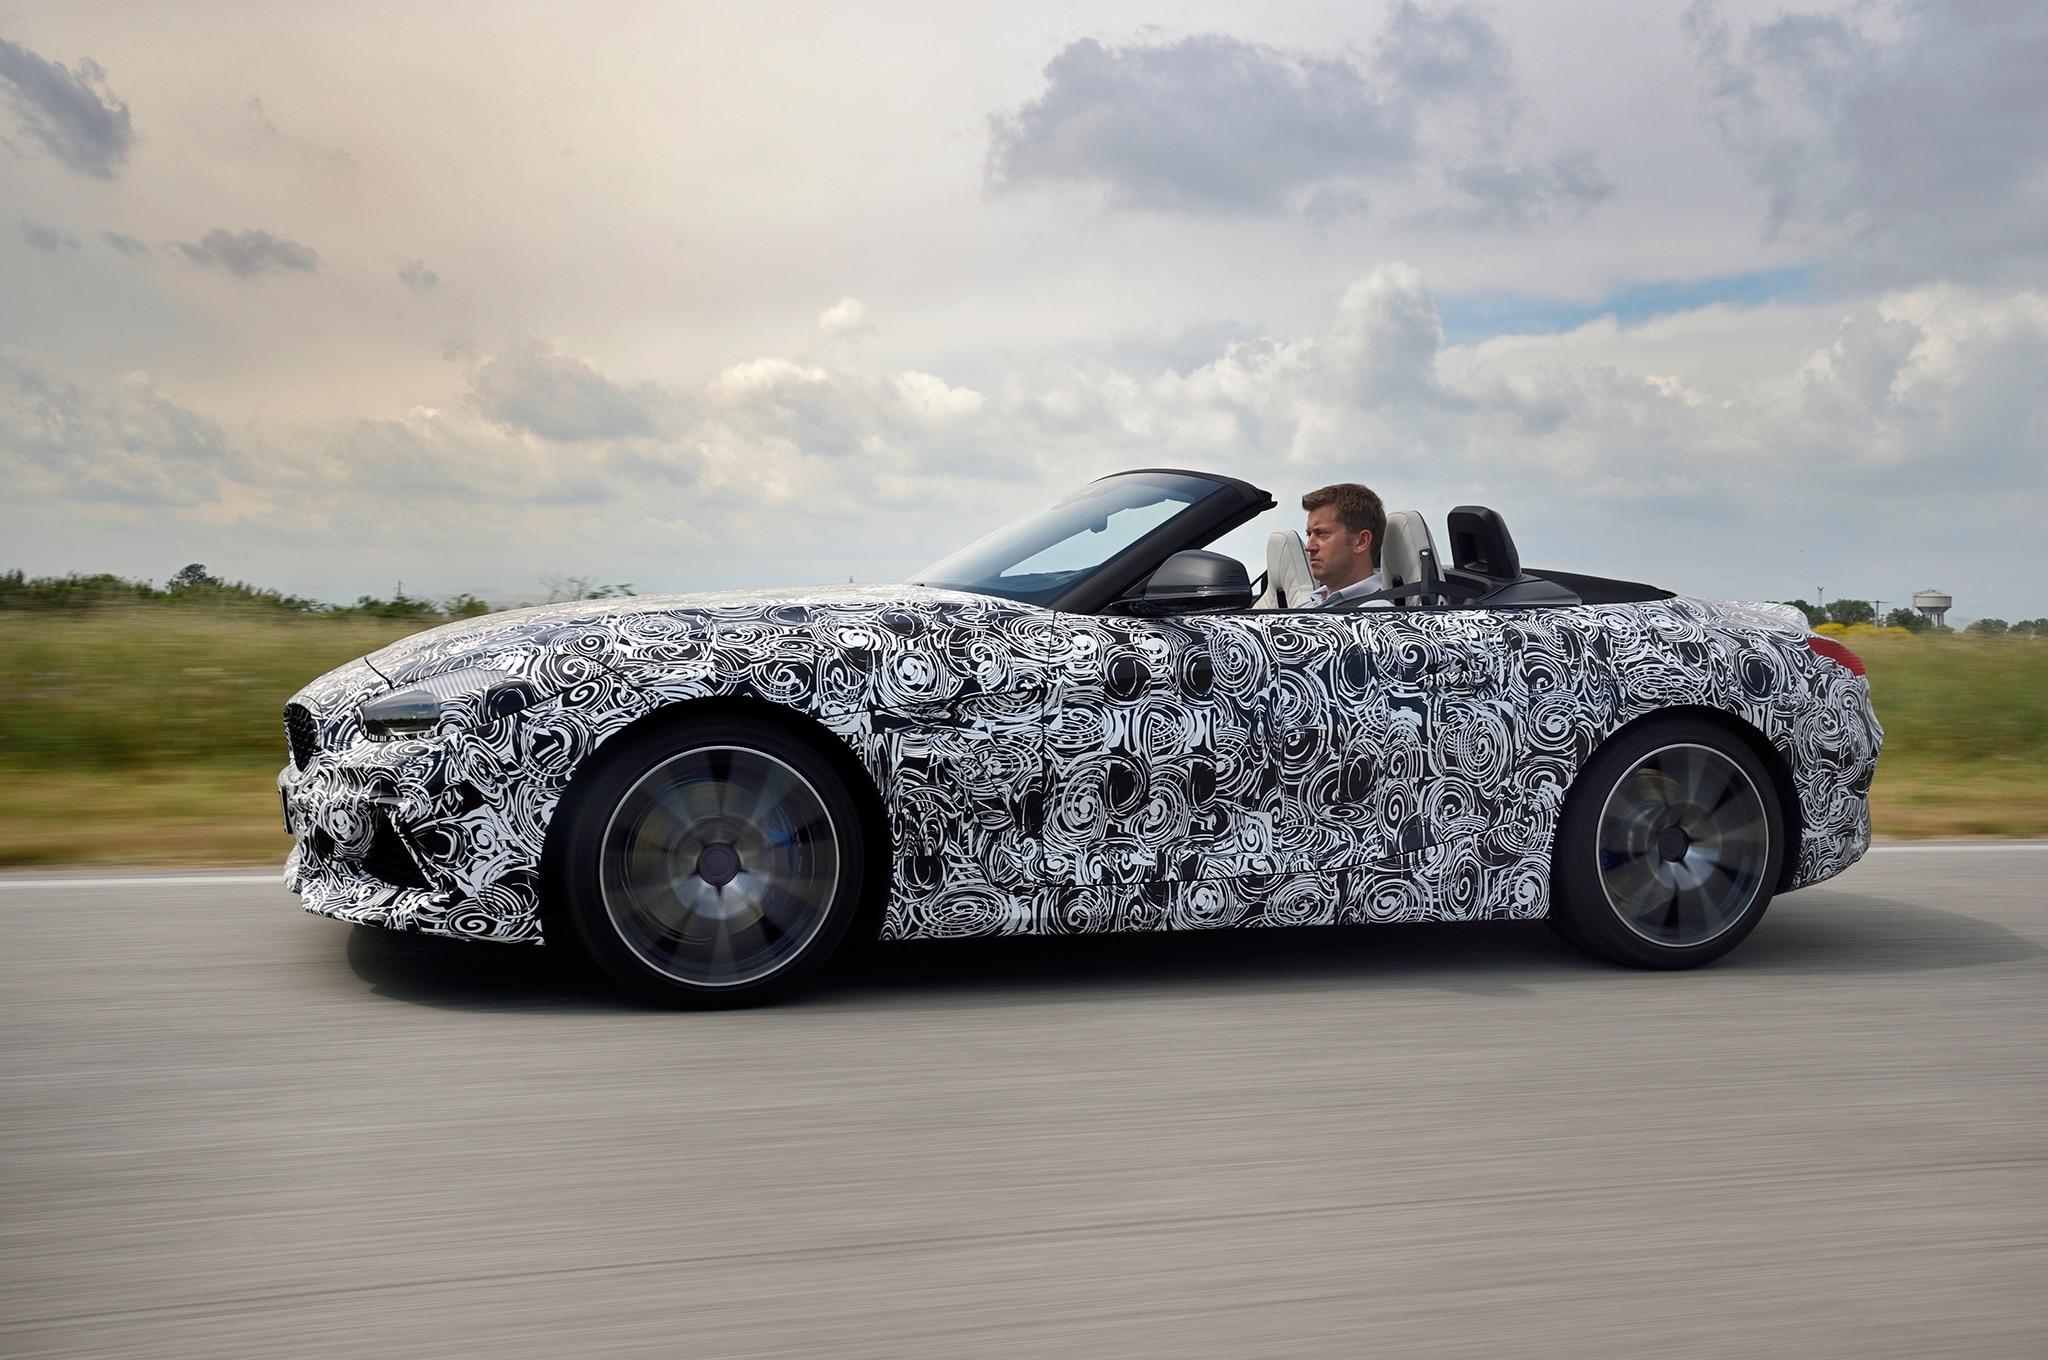 2019 Bmw Z4 M40i Roadster Prototype Drive Review Automobile Magazine